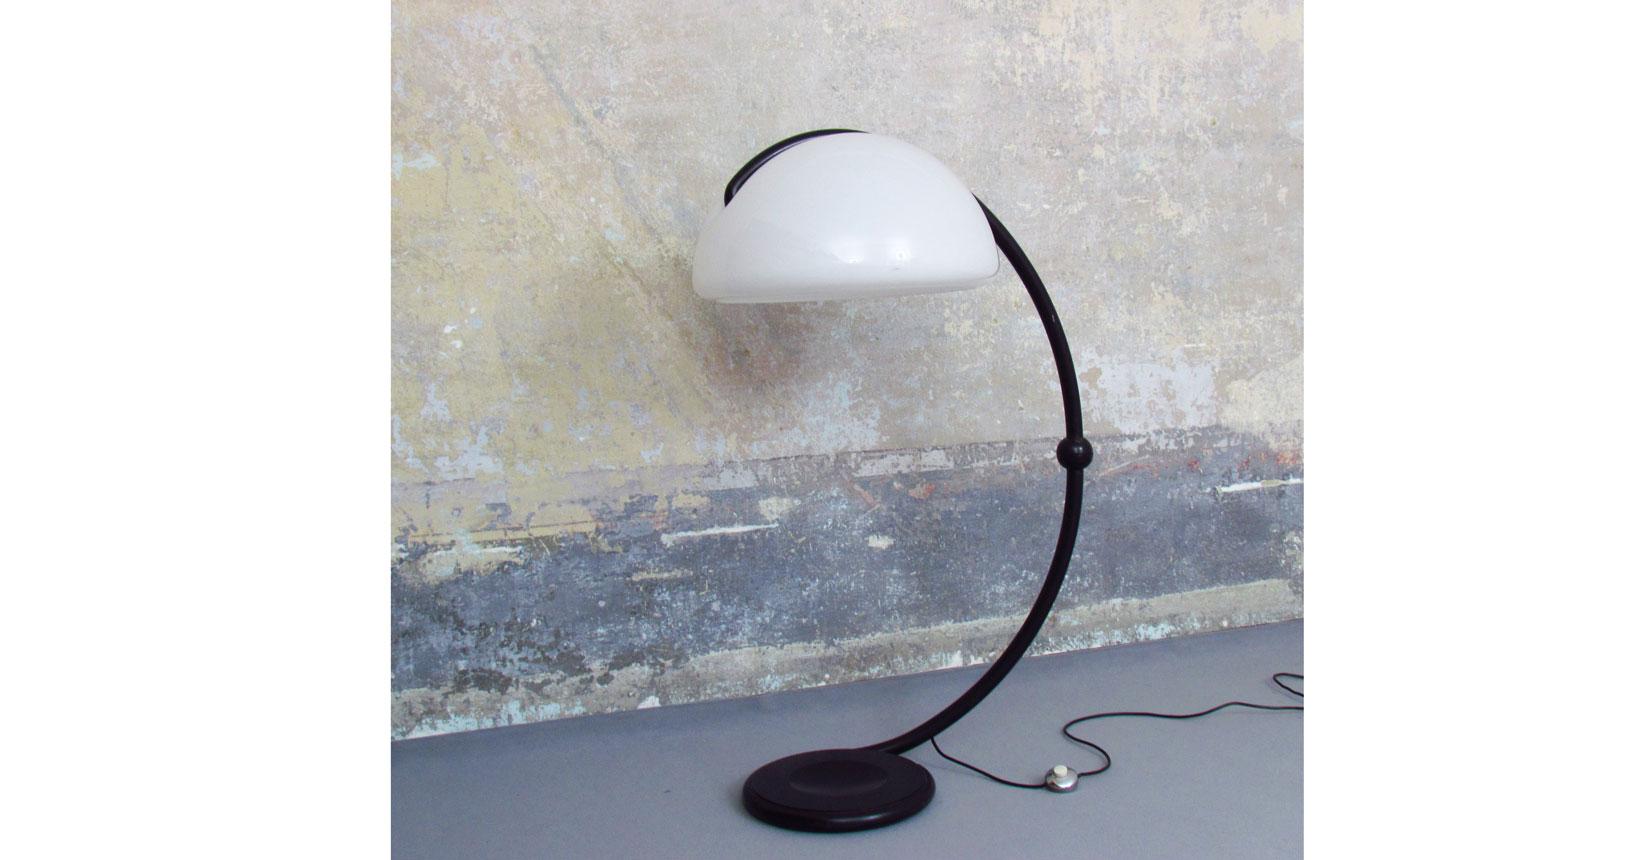 serpente vintage iconic design furniture martinelli elio luce light martinelli luce mid century lamp flos oluce artemide floor lamp